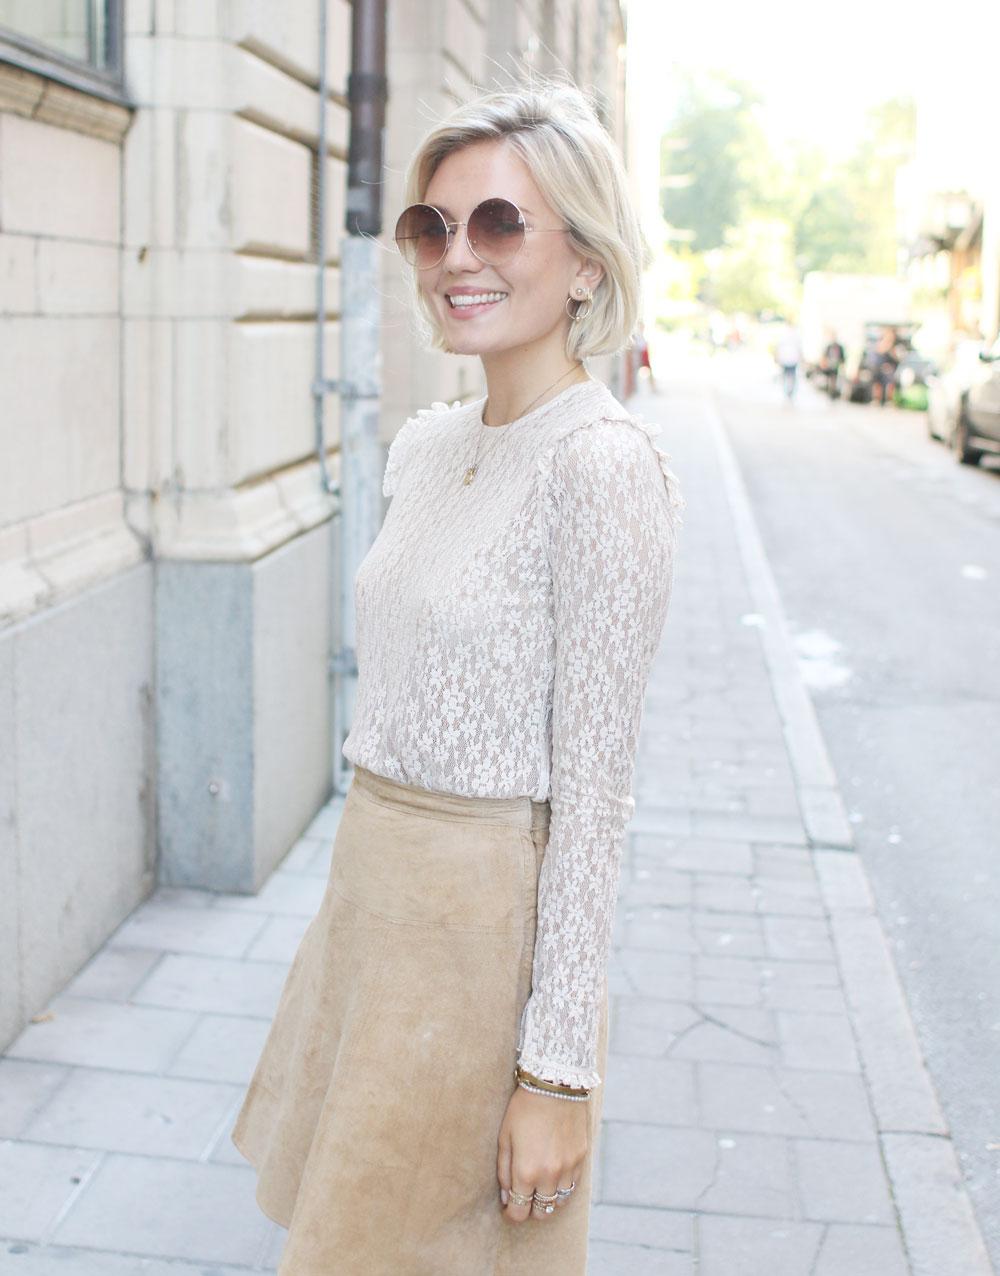 Бежевая юбка светлая